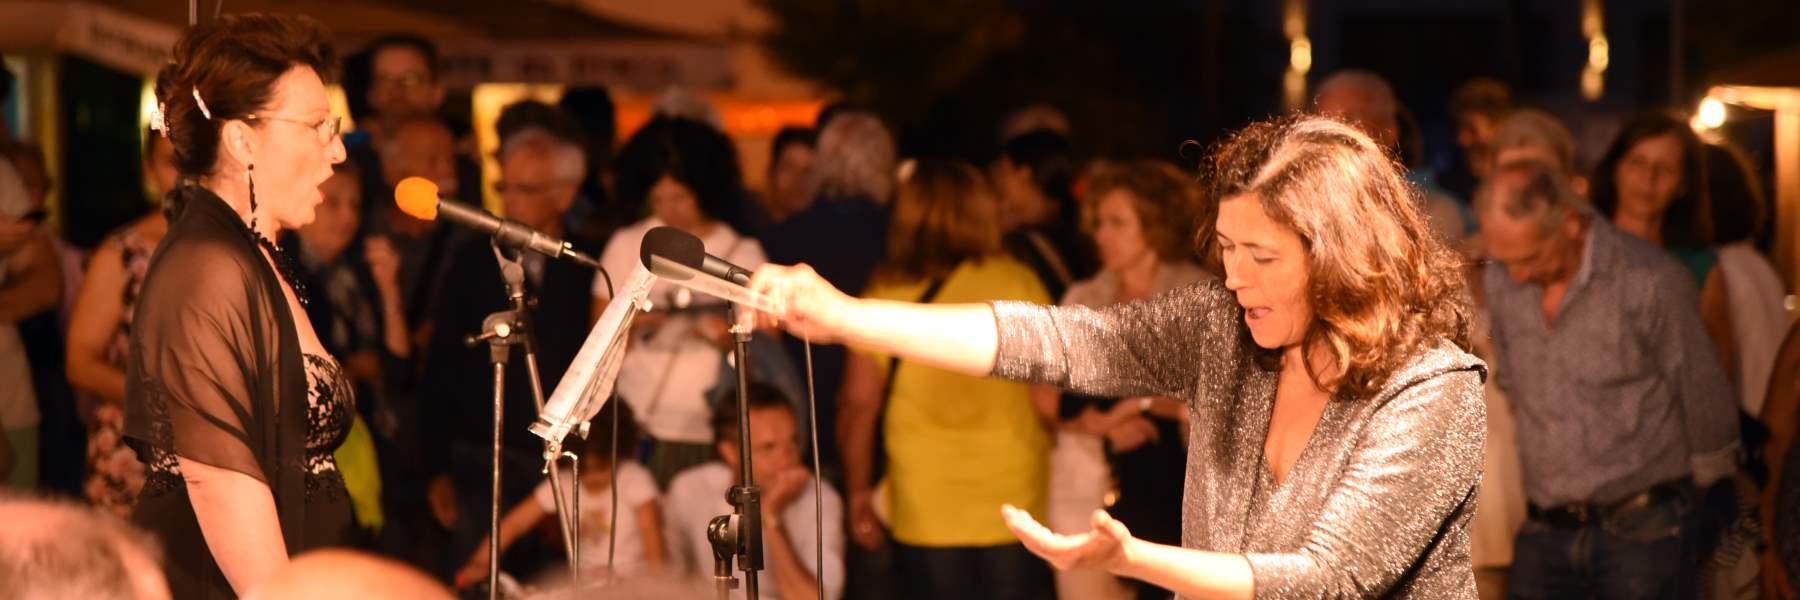 Cervia Town Band Concerts in Milano Marittima